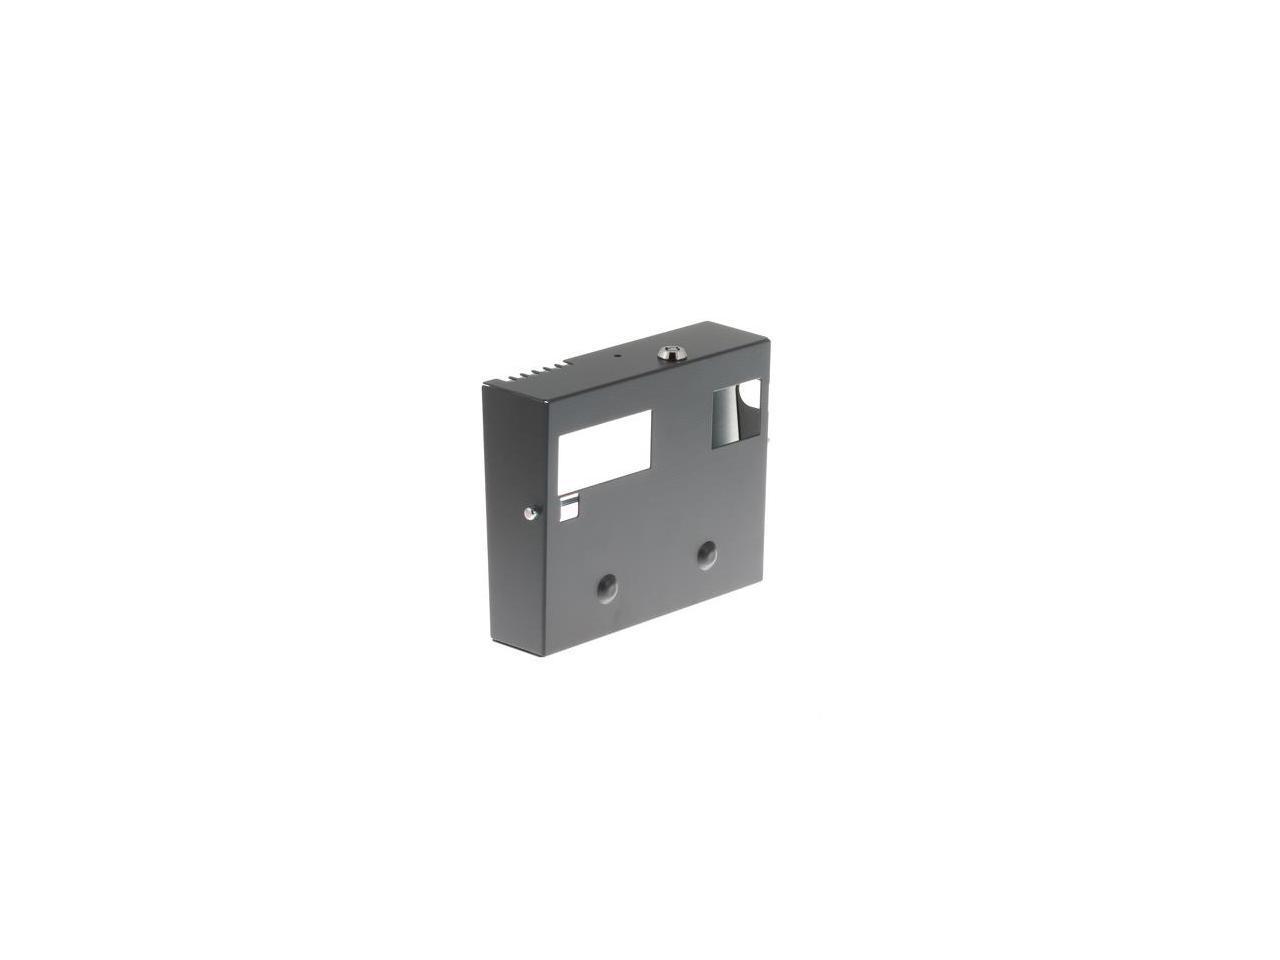 Cisco Universal Locking Wall Mounting Kit for